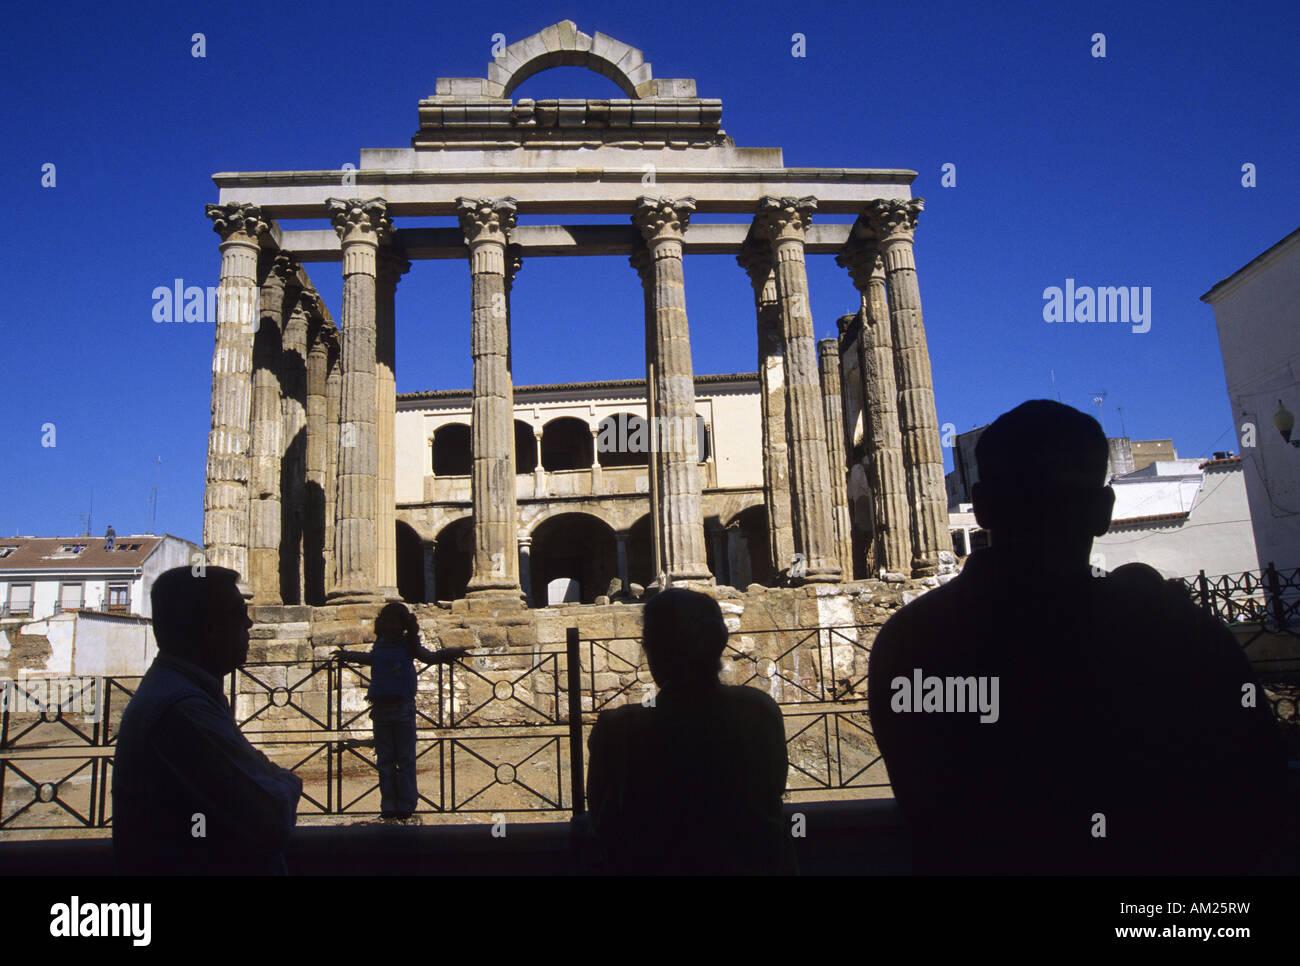 Temple of Diana MERIDA Badajoz Extremadura Spain - Stock Image